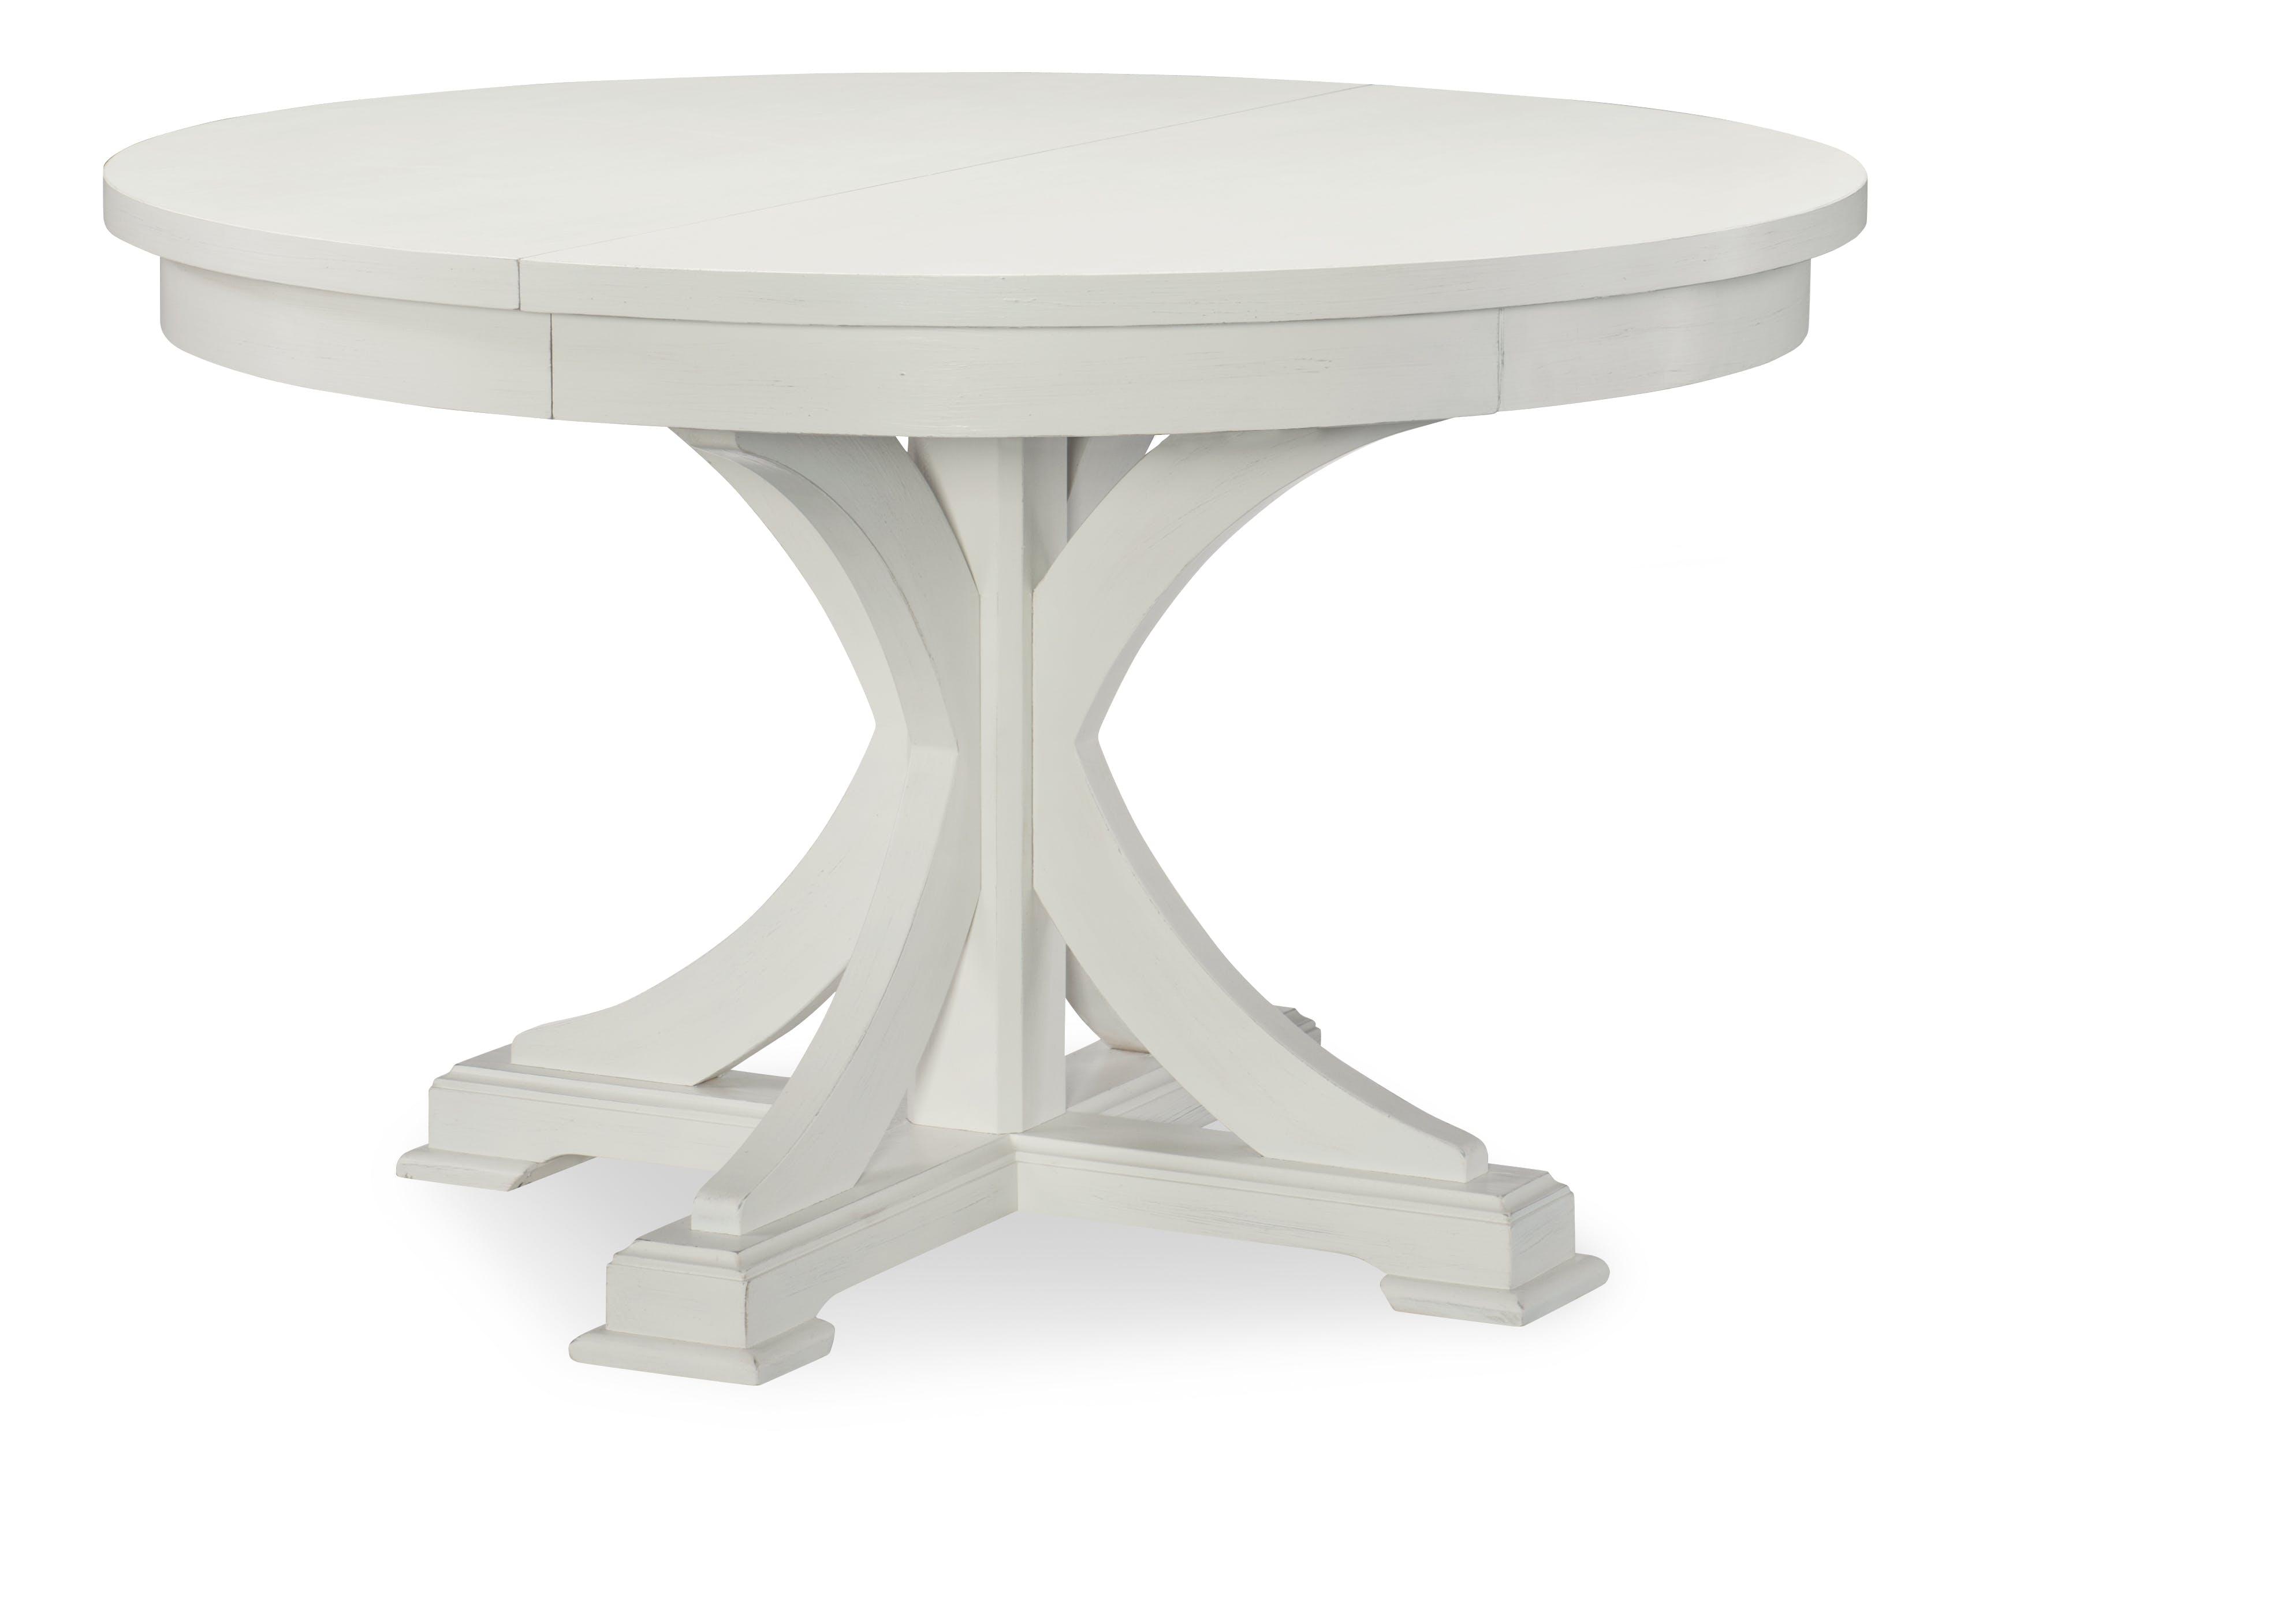 Round to Oval Pedestal Table - Sea Salt QL7004521K